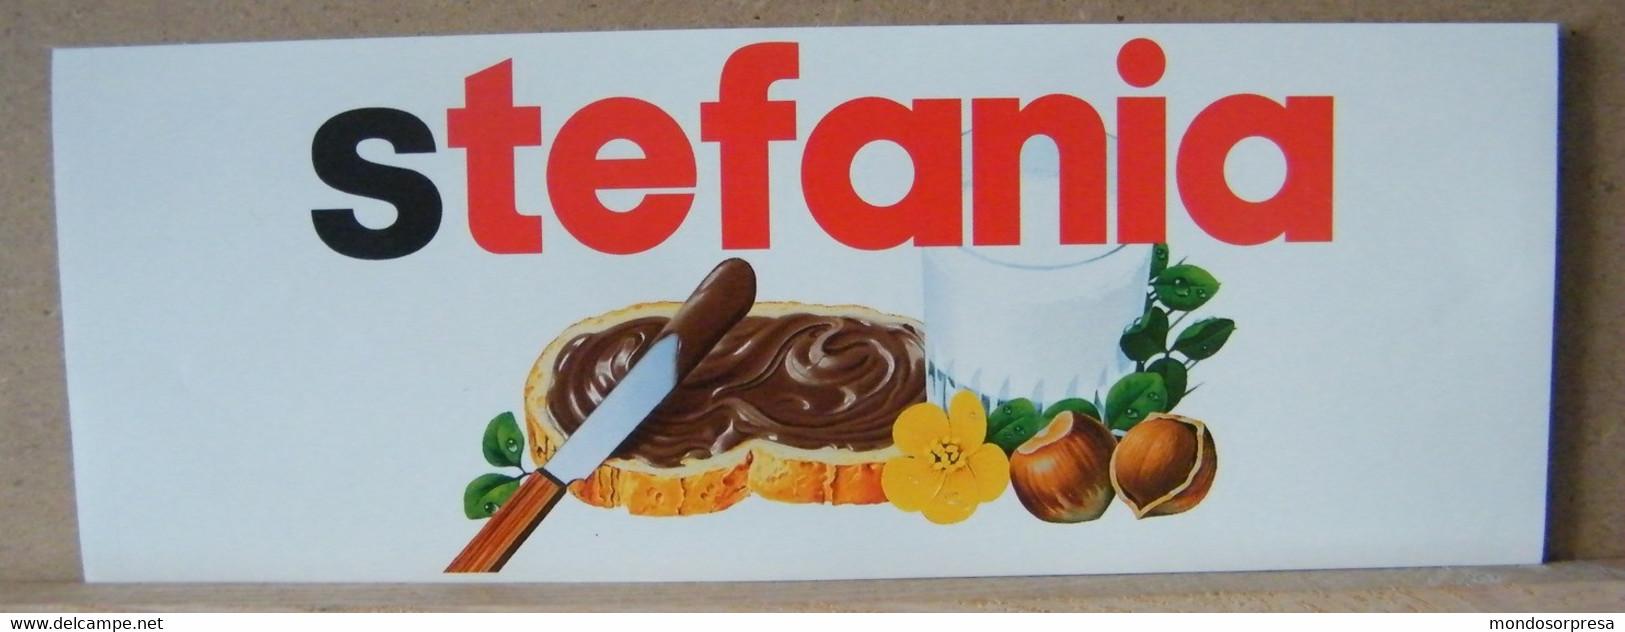 MONDOSORPRESA, ADESIVI NUTELLA NOMI, STEFANIA - Nutella